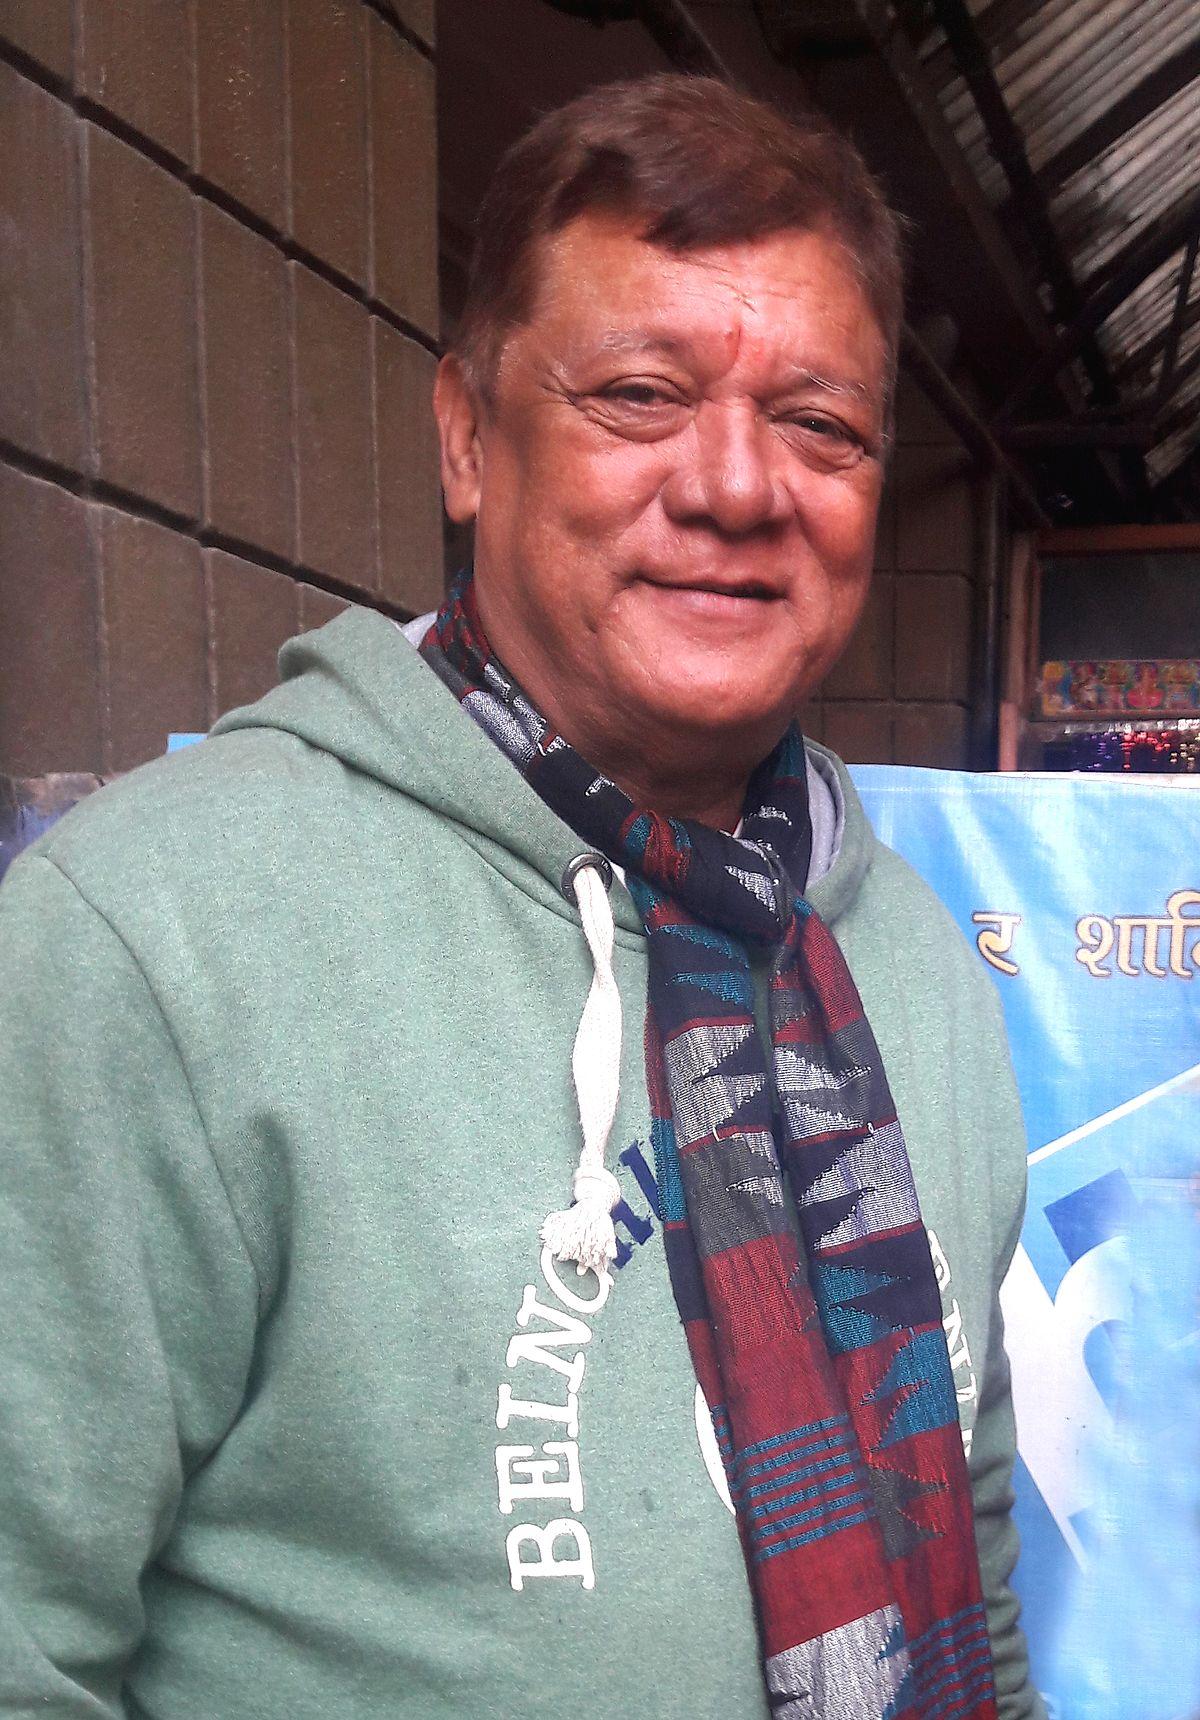 Richard Armitage (born 1971),Yvette Bova Adult fotos Miwako Fujitani,Georgia Engel